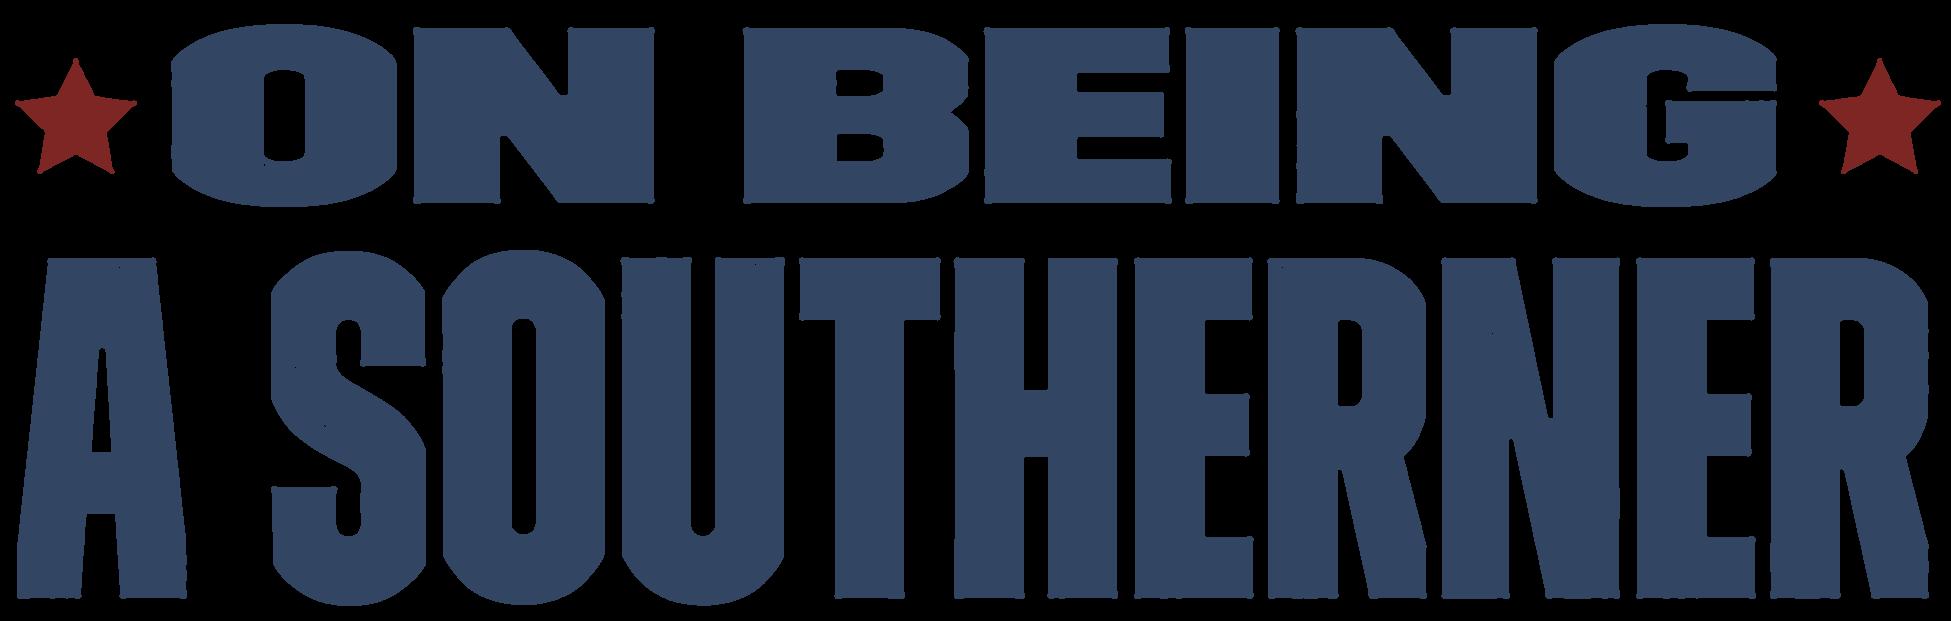 BS089_Lewis_Titles04-Southerner.png